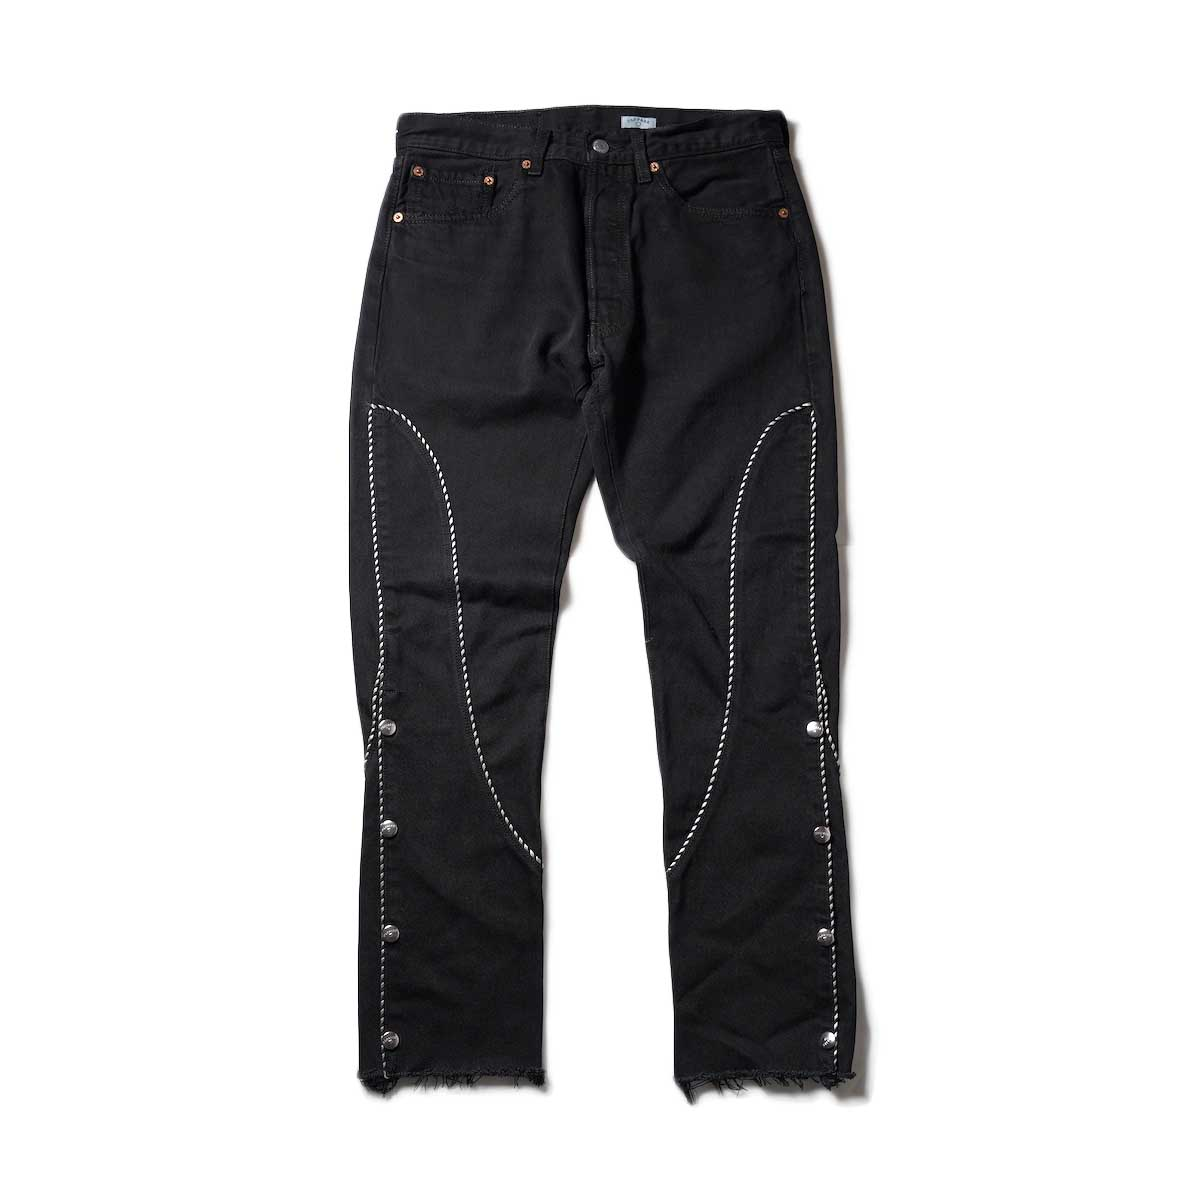 OLD PARK / Western Jeans2 Black (Ssize-B)